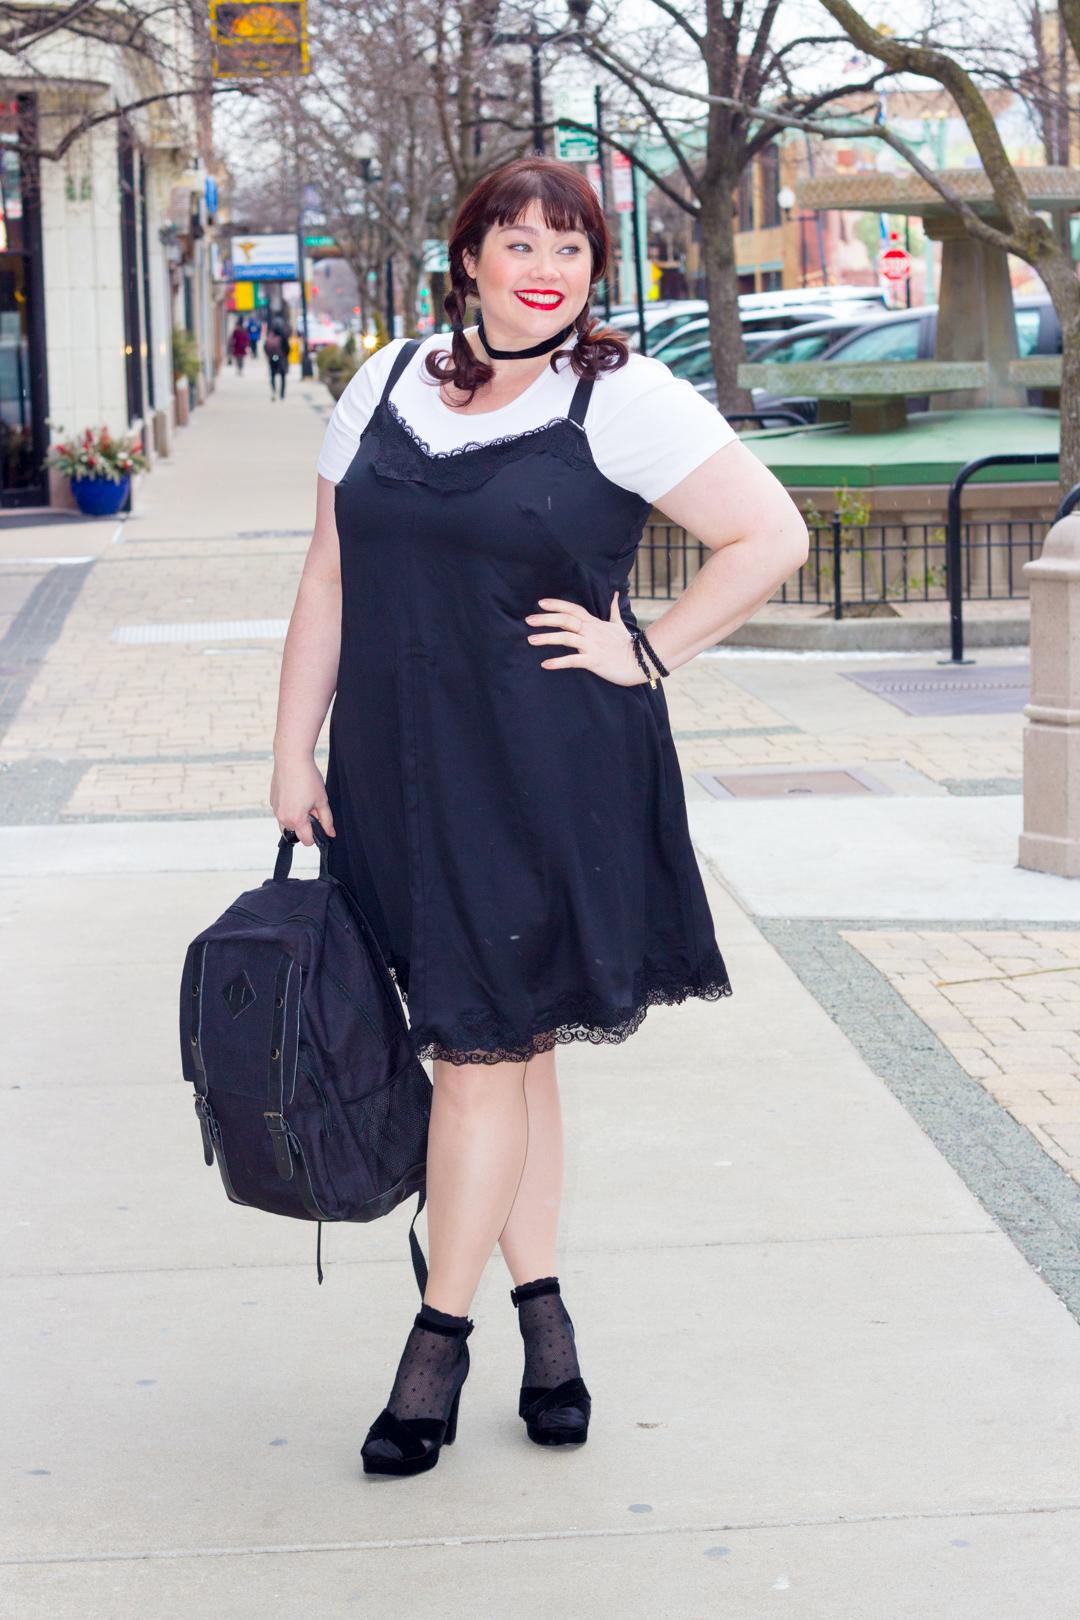 Plus Size Trend Alert: 90s Inspired T-shirts Under Slipdresses